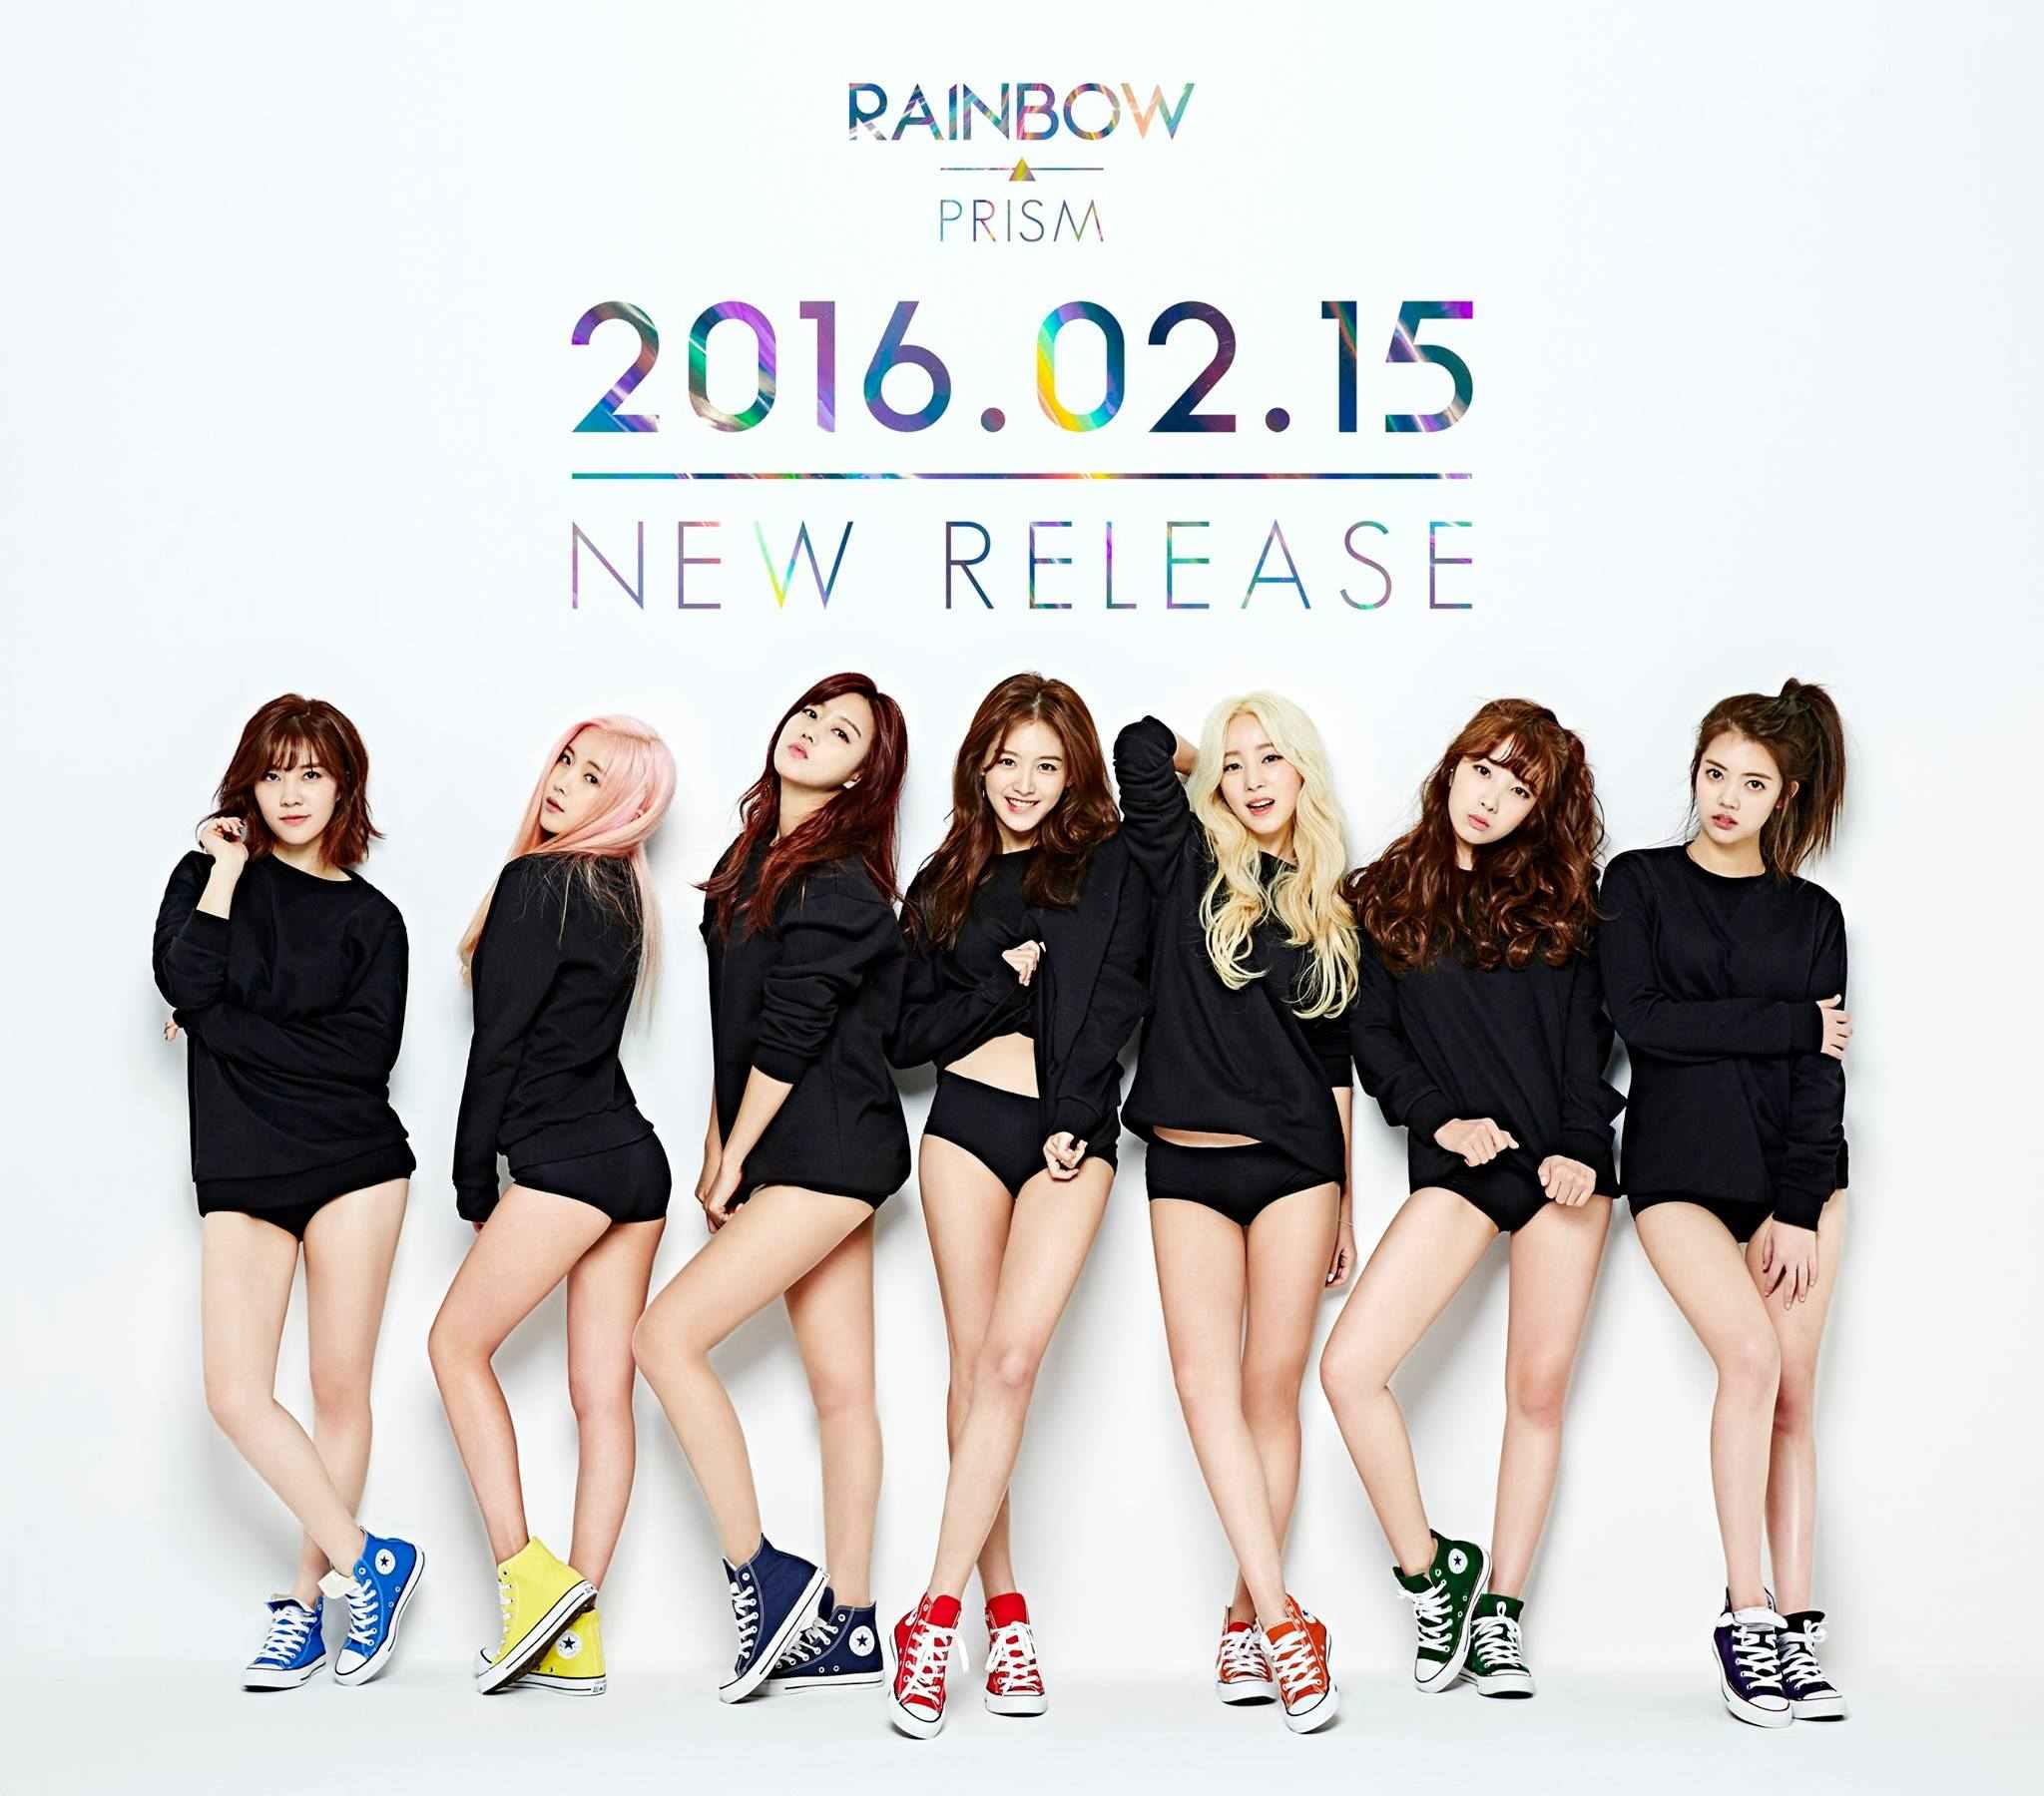 Rainbow 【2009年出道】-代表曲:A 最讓Rainbow成員難過的一句話就是「什麼都會,就是不會拿冠軍的女團」。在DSP打算推出新女團Rainbow時,師姐卻在日本大紅~形成了DSP將更多的資源投資在師姐身上的情形